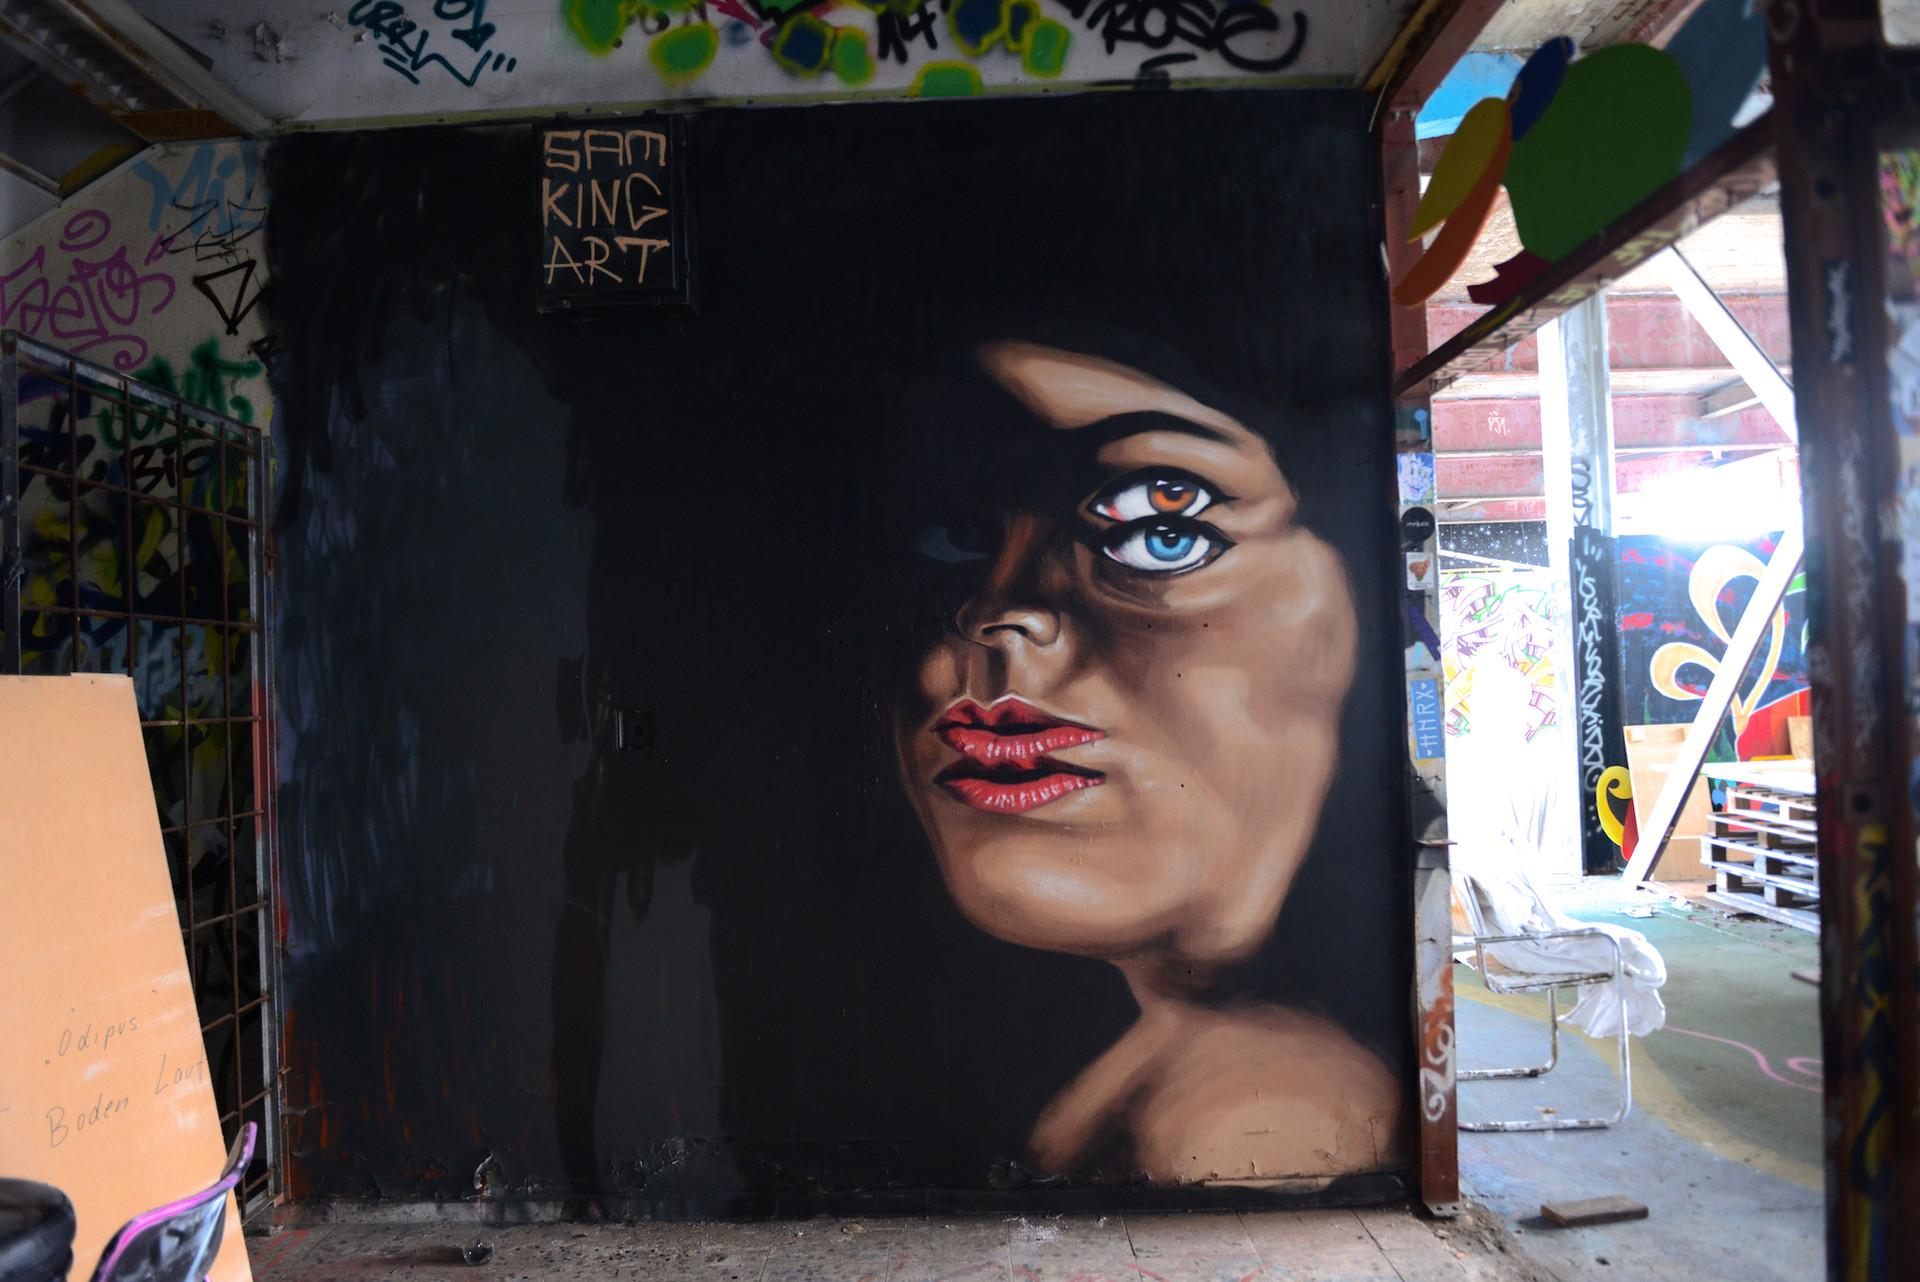 Sam King Art (GB)